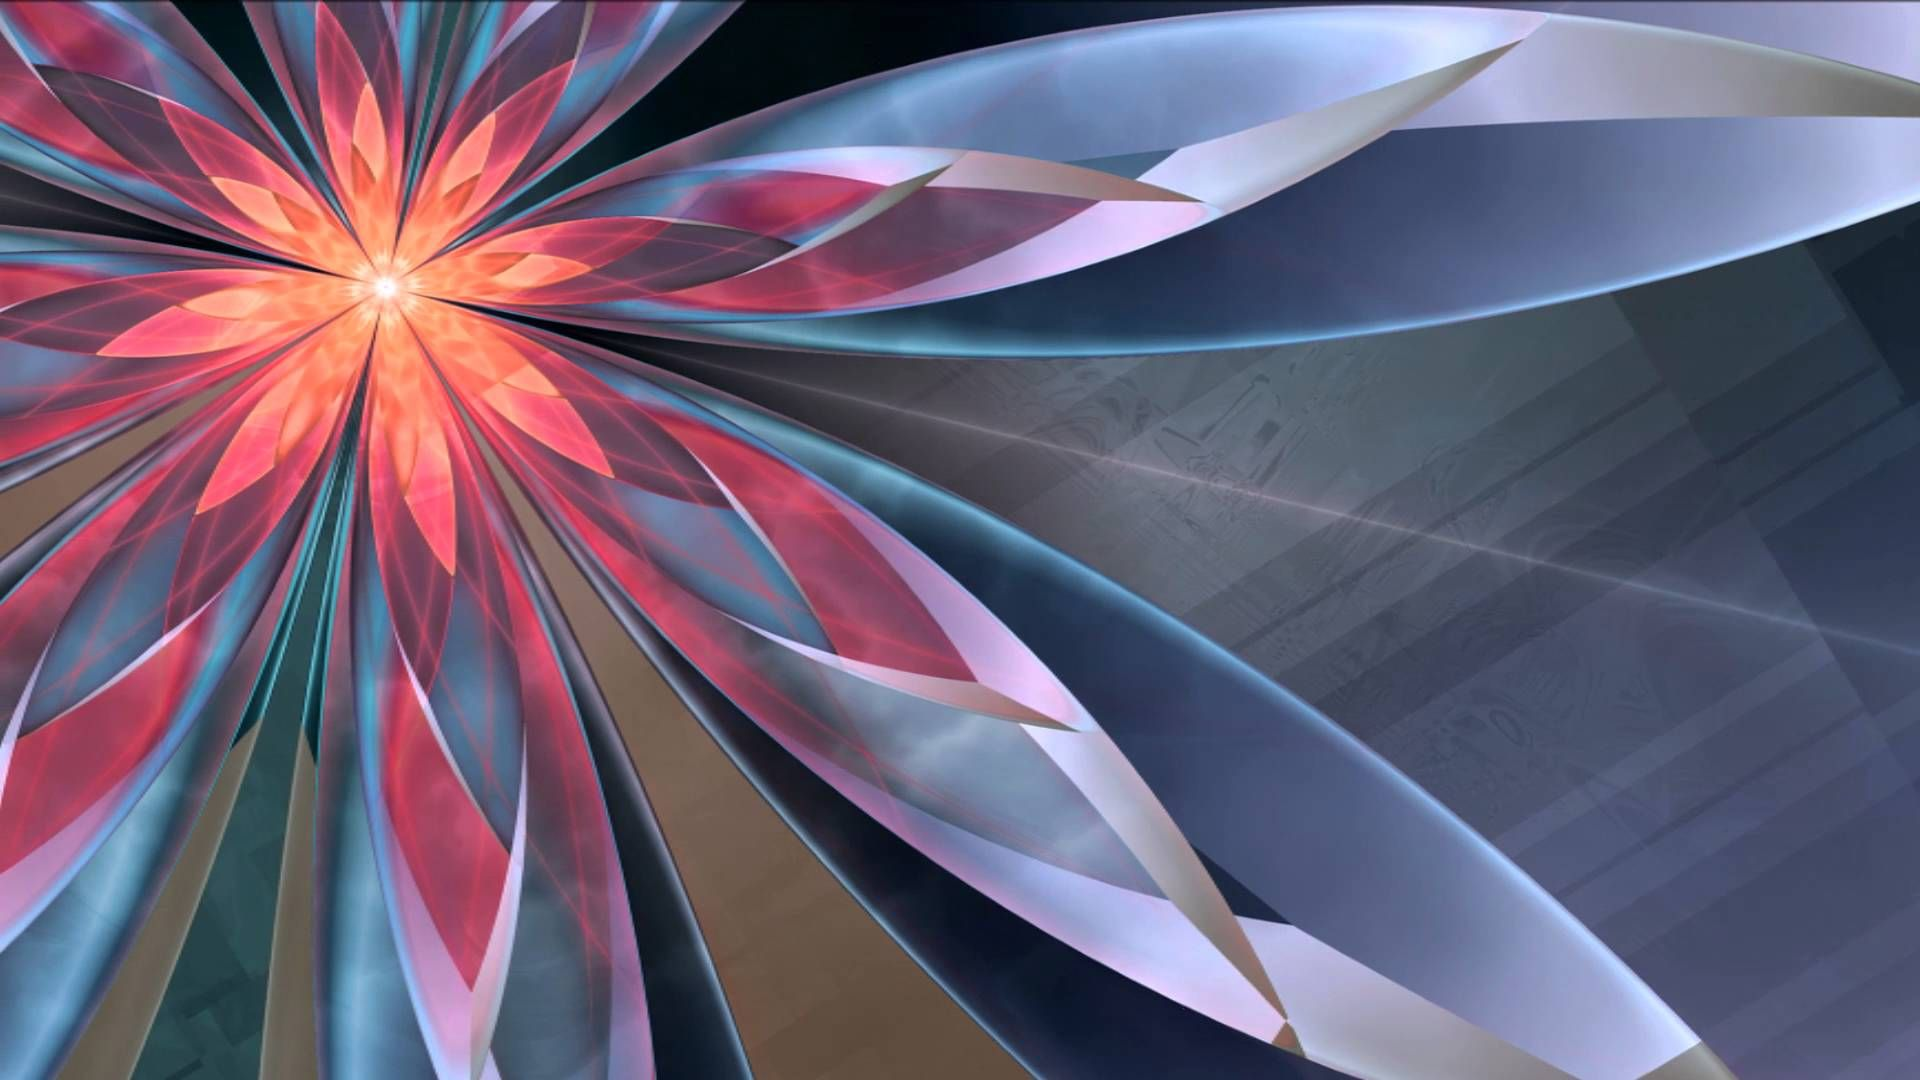 Wallpaper Desktop Abstract, Abstraction